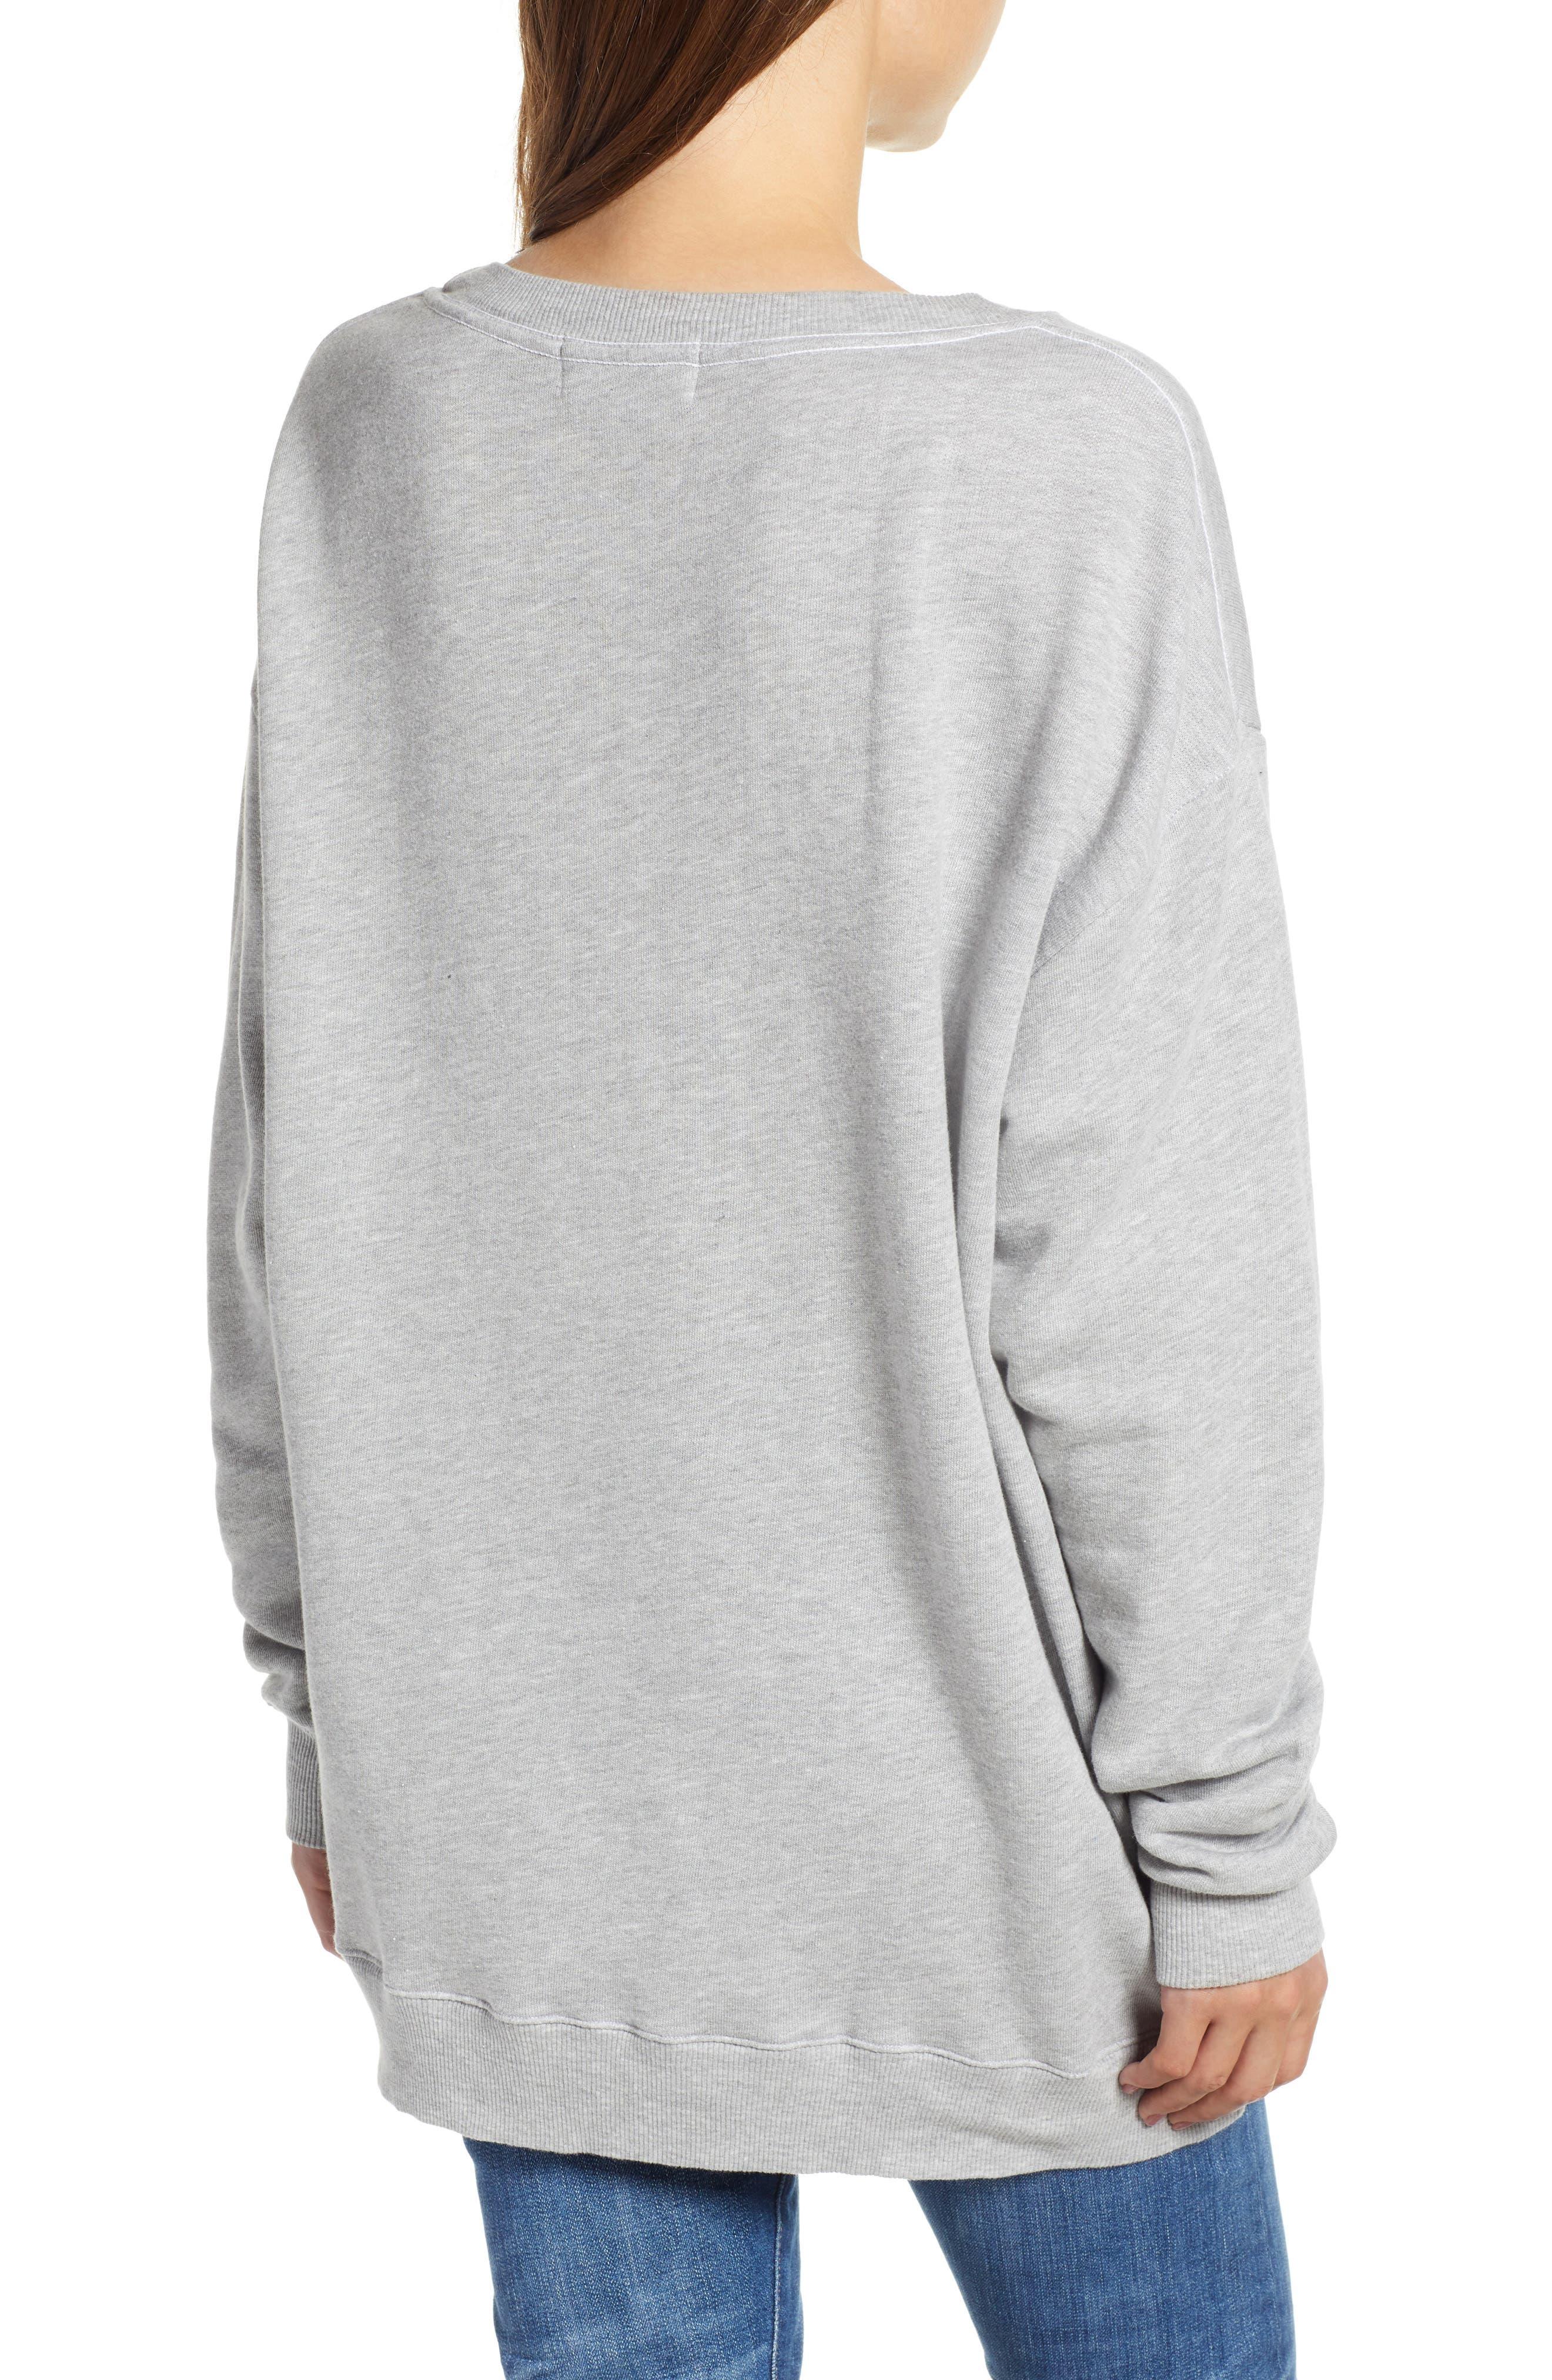 Roadtrip Sweatshirt,                             Alternate thumbnail 2, color,                             HEATHER